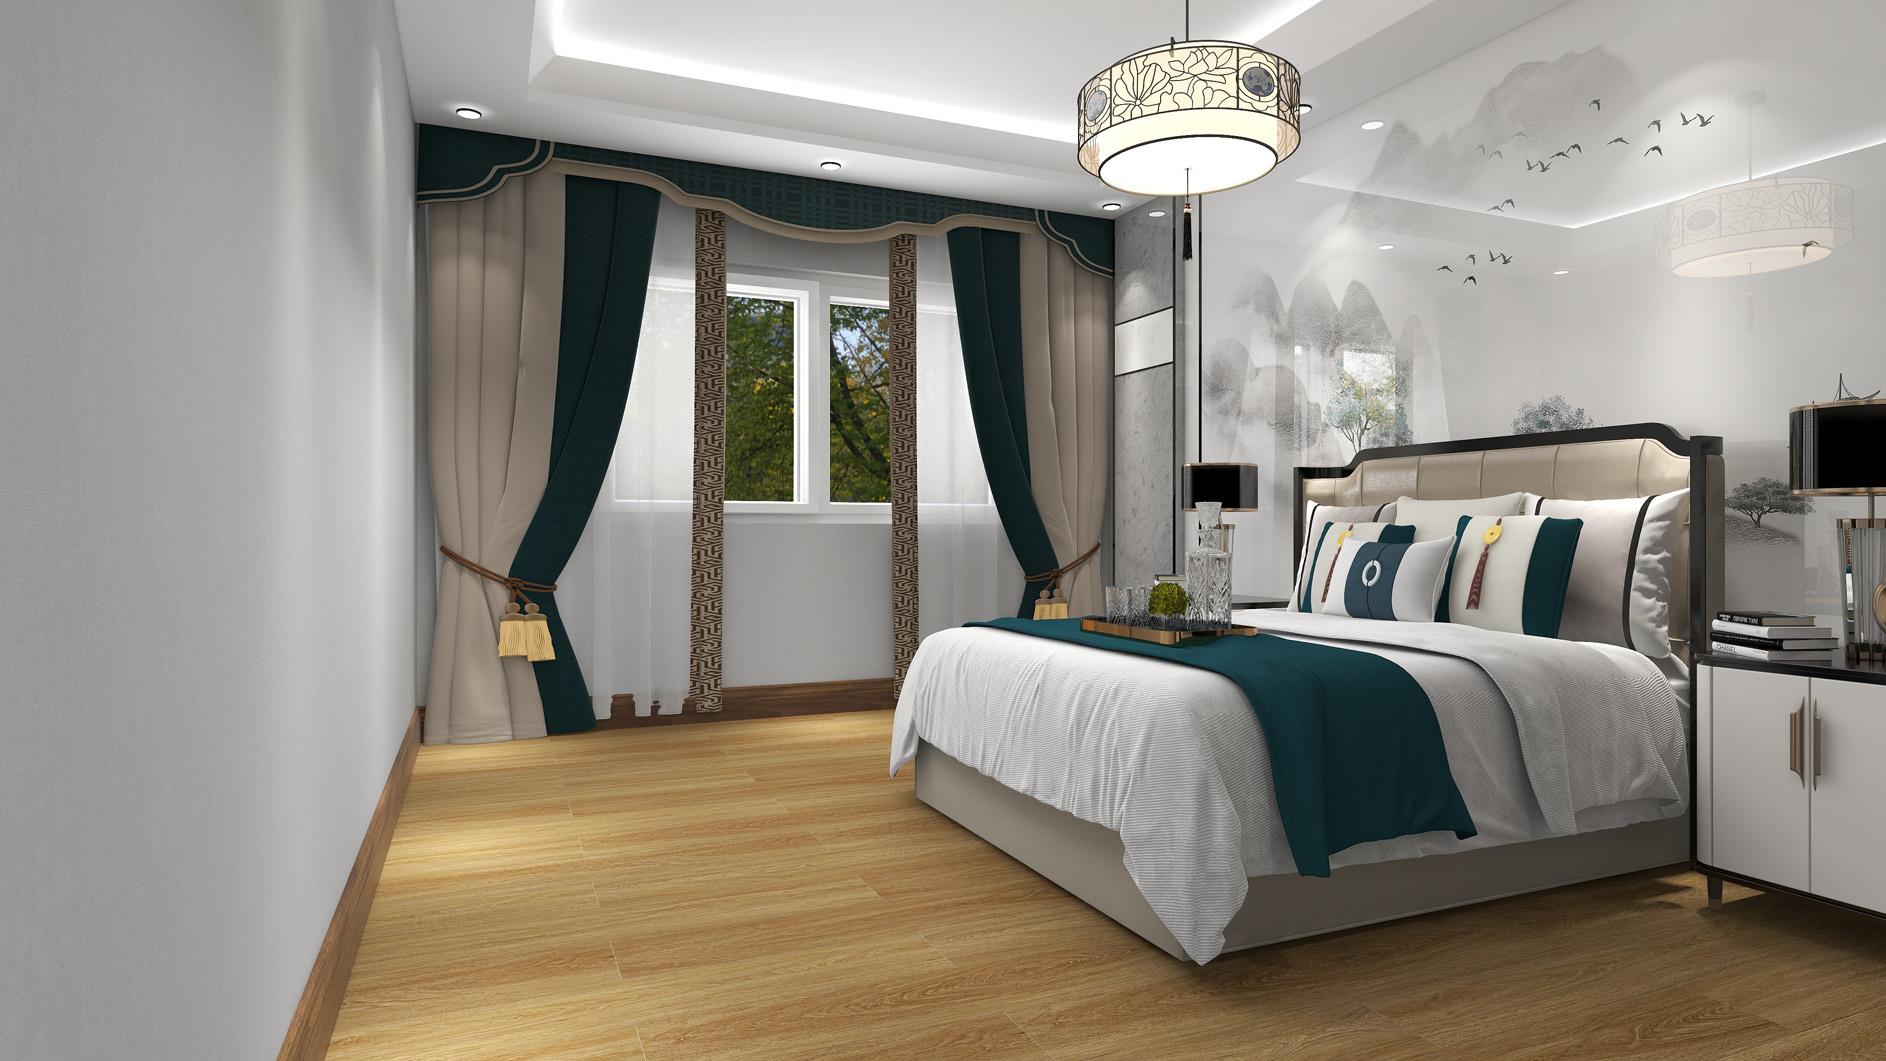 proimages/Caesar/3117-room-scene-1.jpg